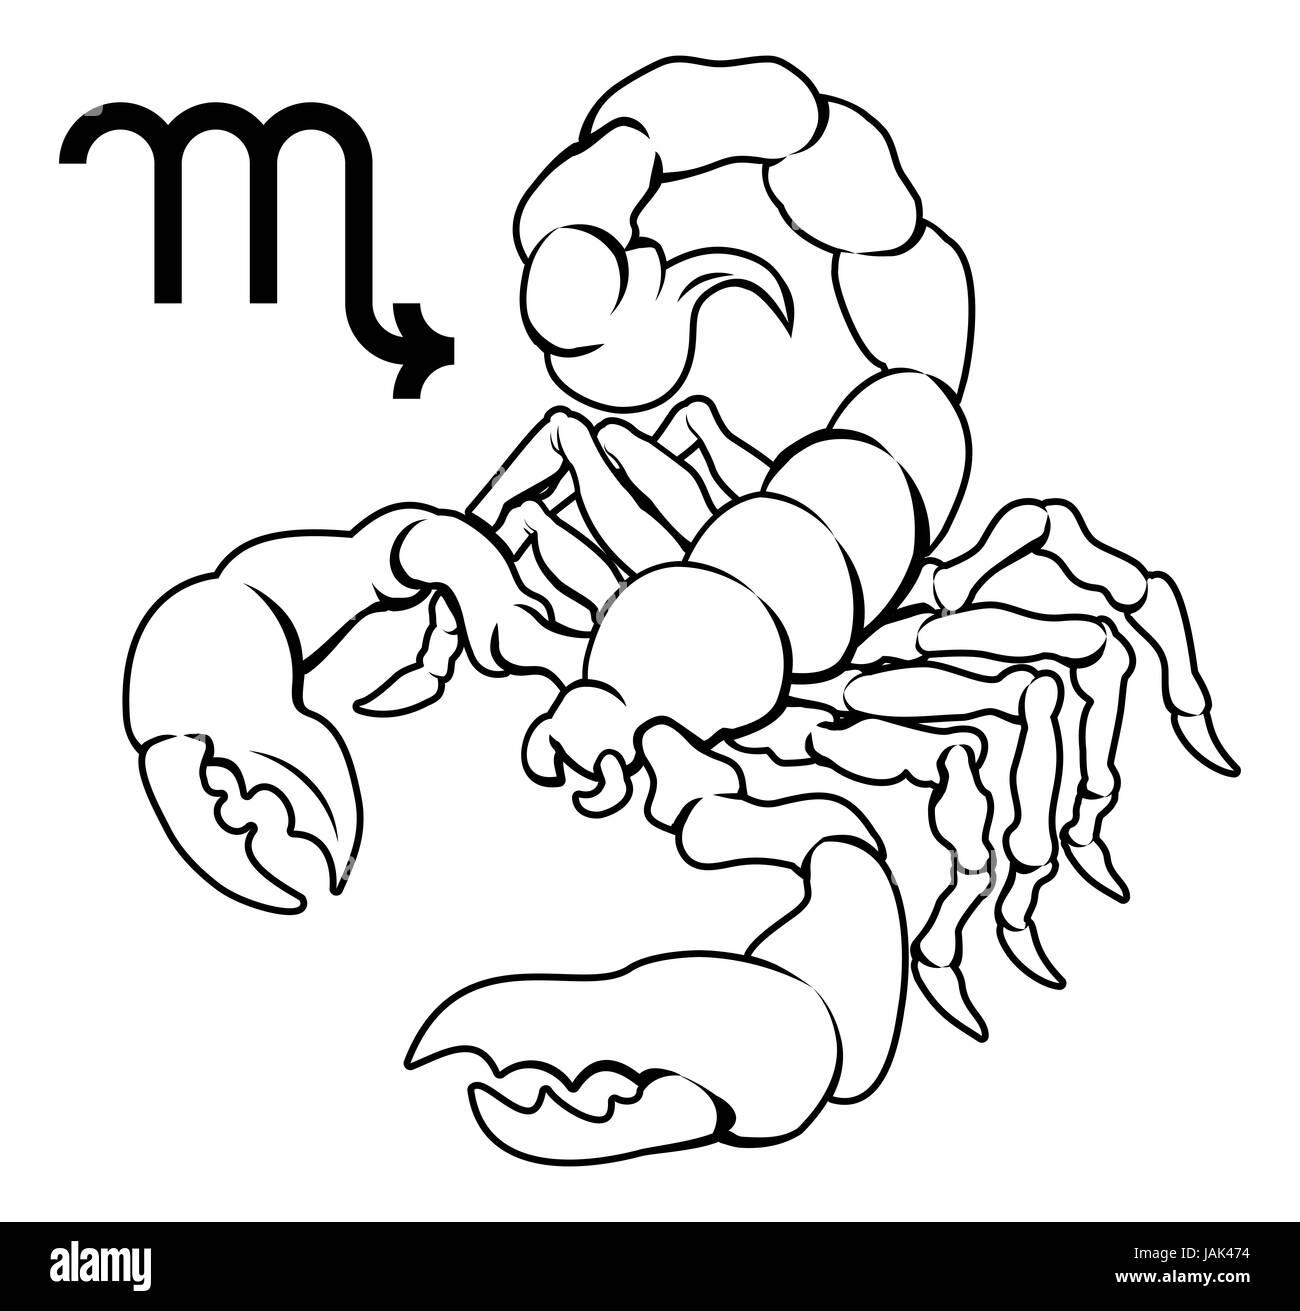 Illustration of  Scorpio the scorpion zodiac horoscope astrology sign - Stock Image